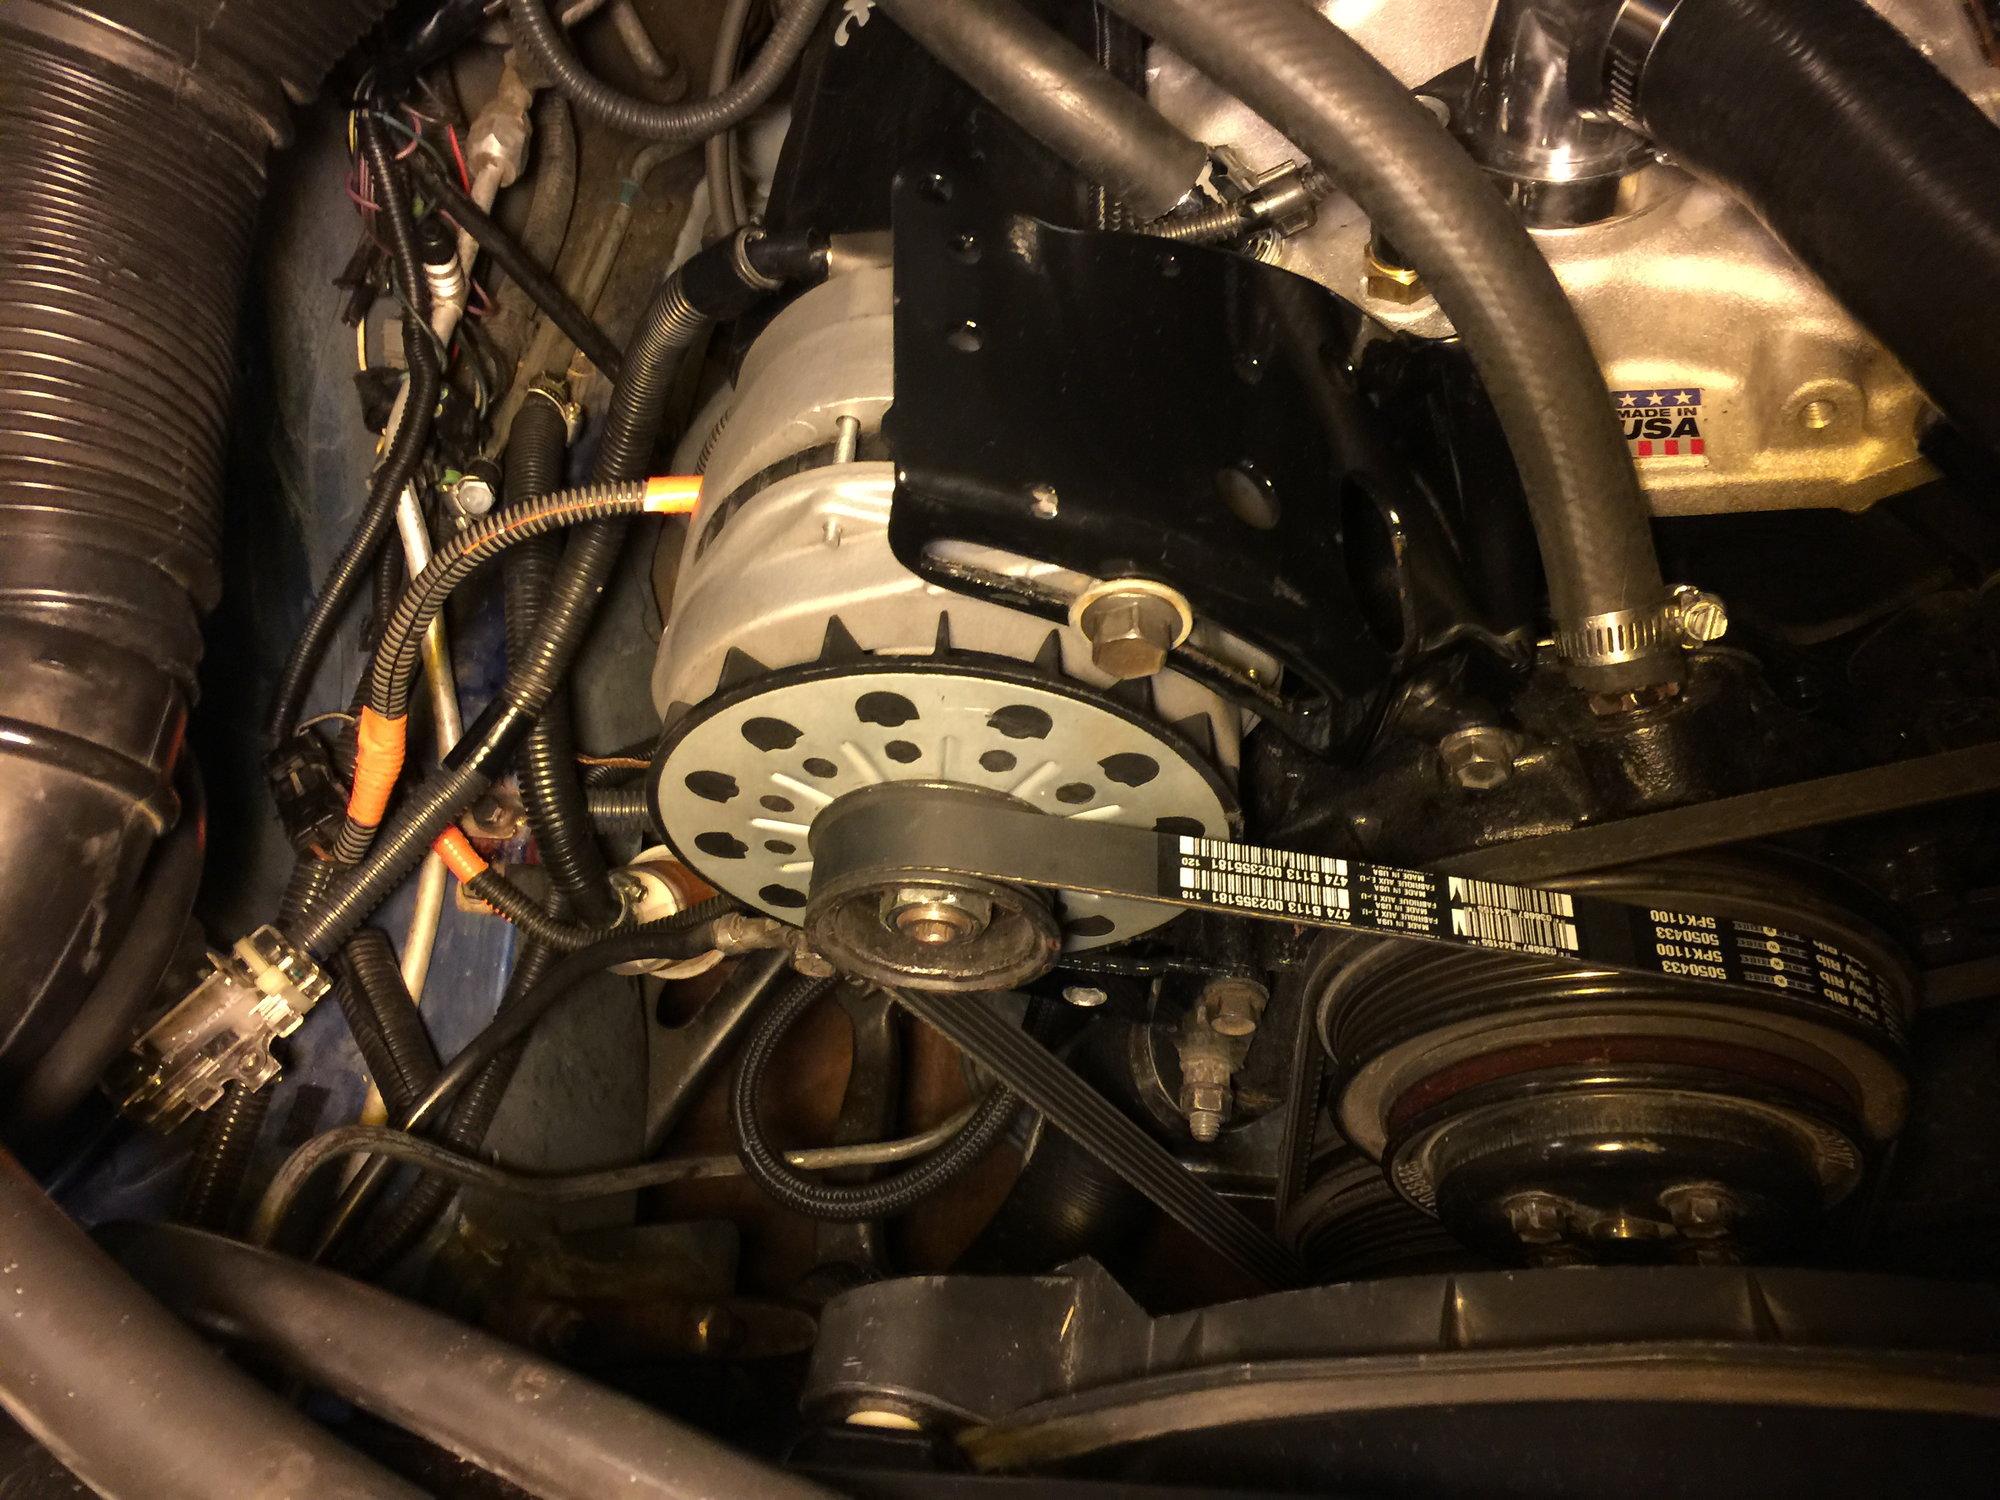 86 Camaro Alternator Wiring Diagram